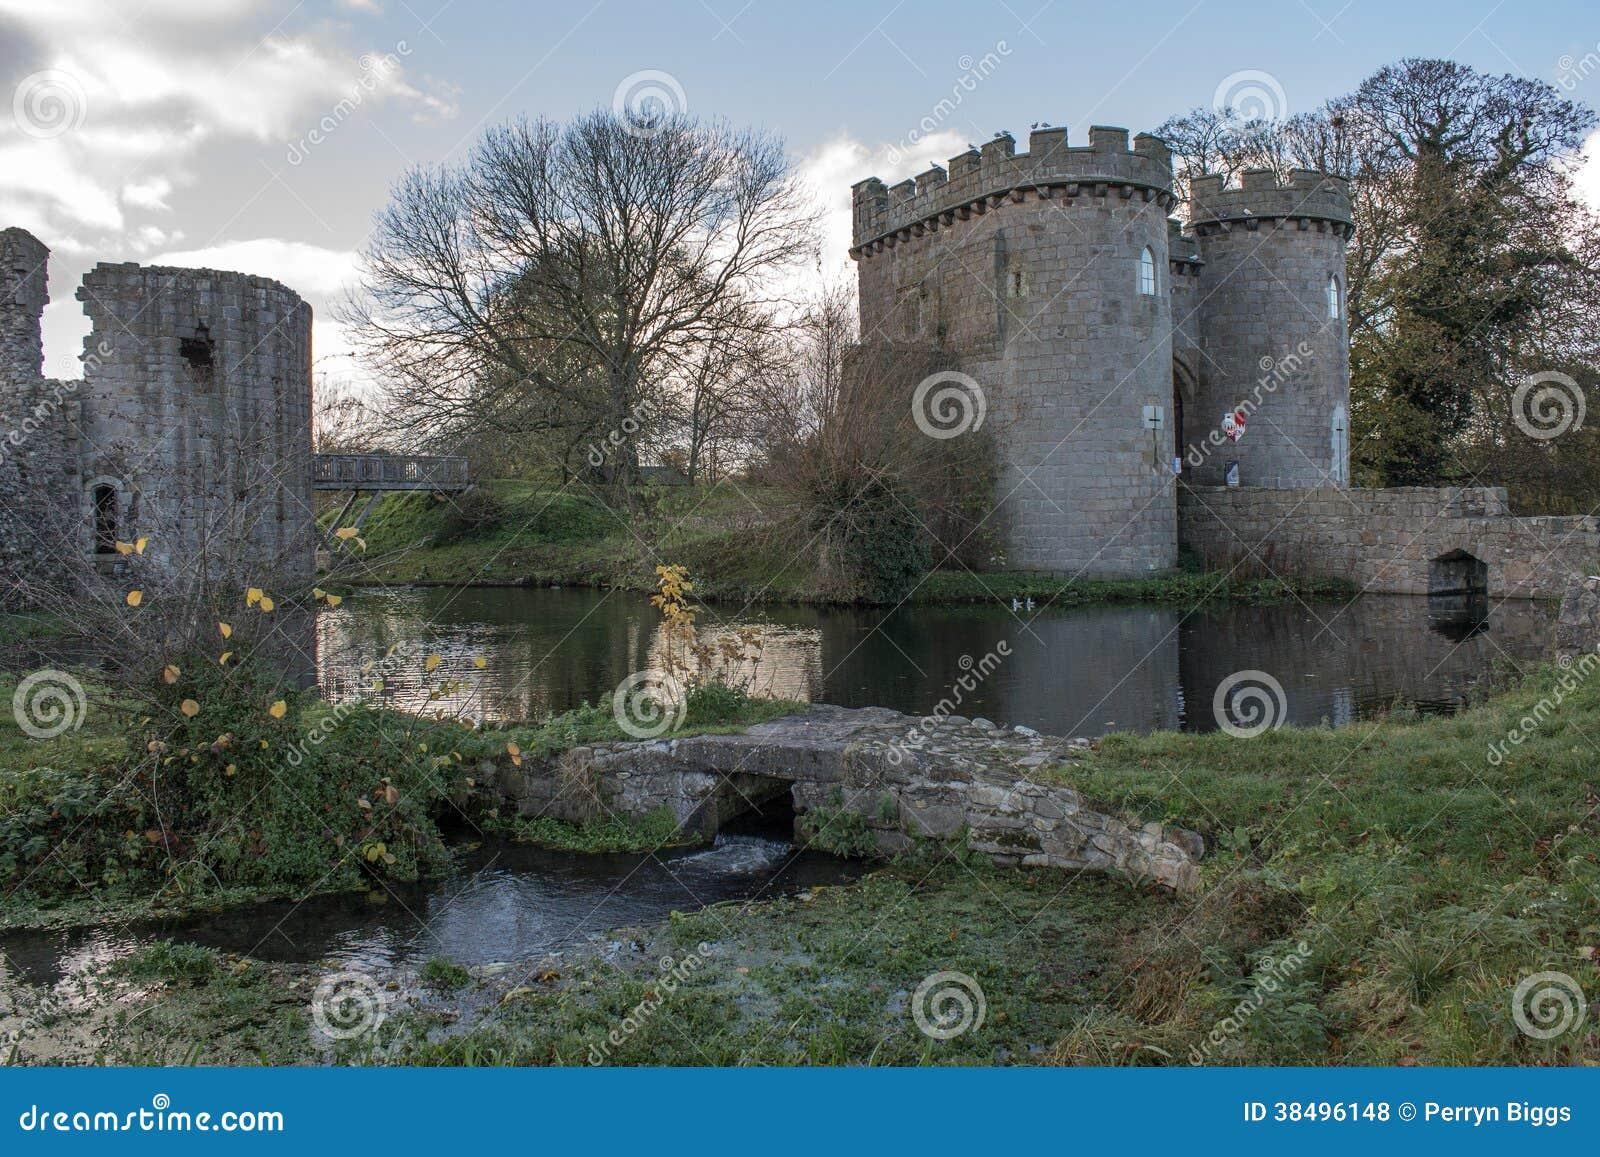 Oswestry United Kingdom  city photos gallery : Whittington Castle, Shropshire near Oswestry United Kingdom.